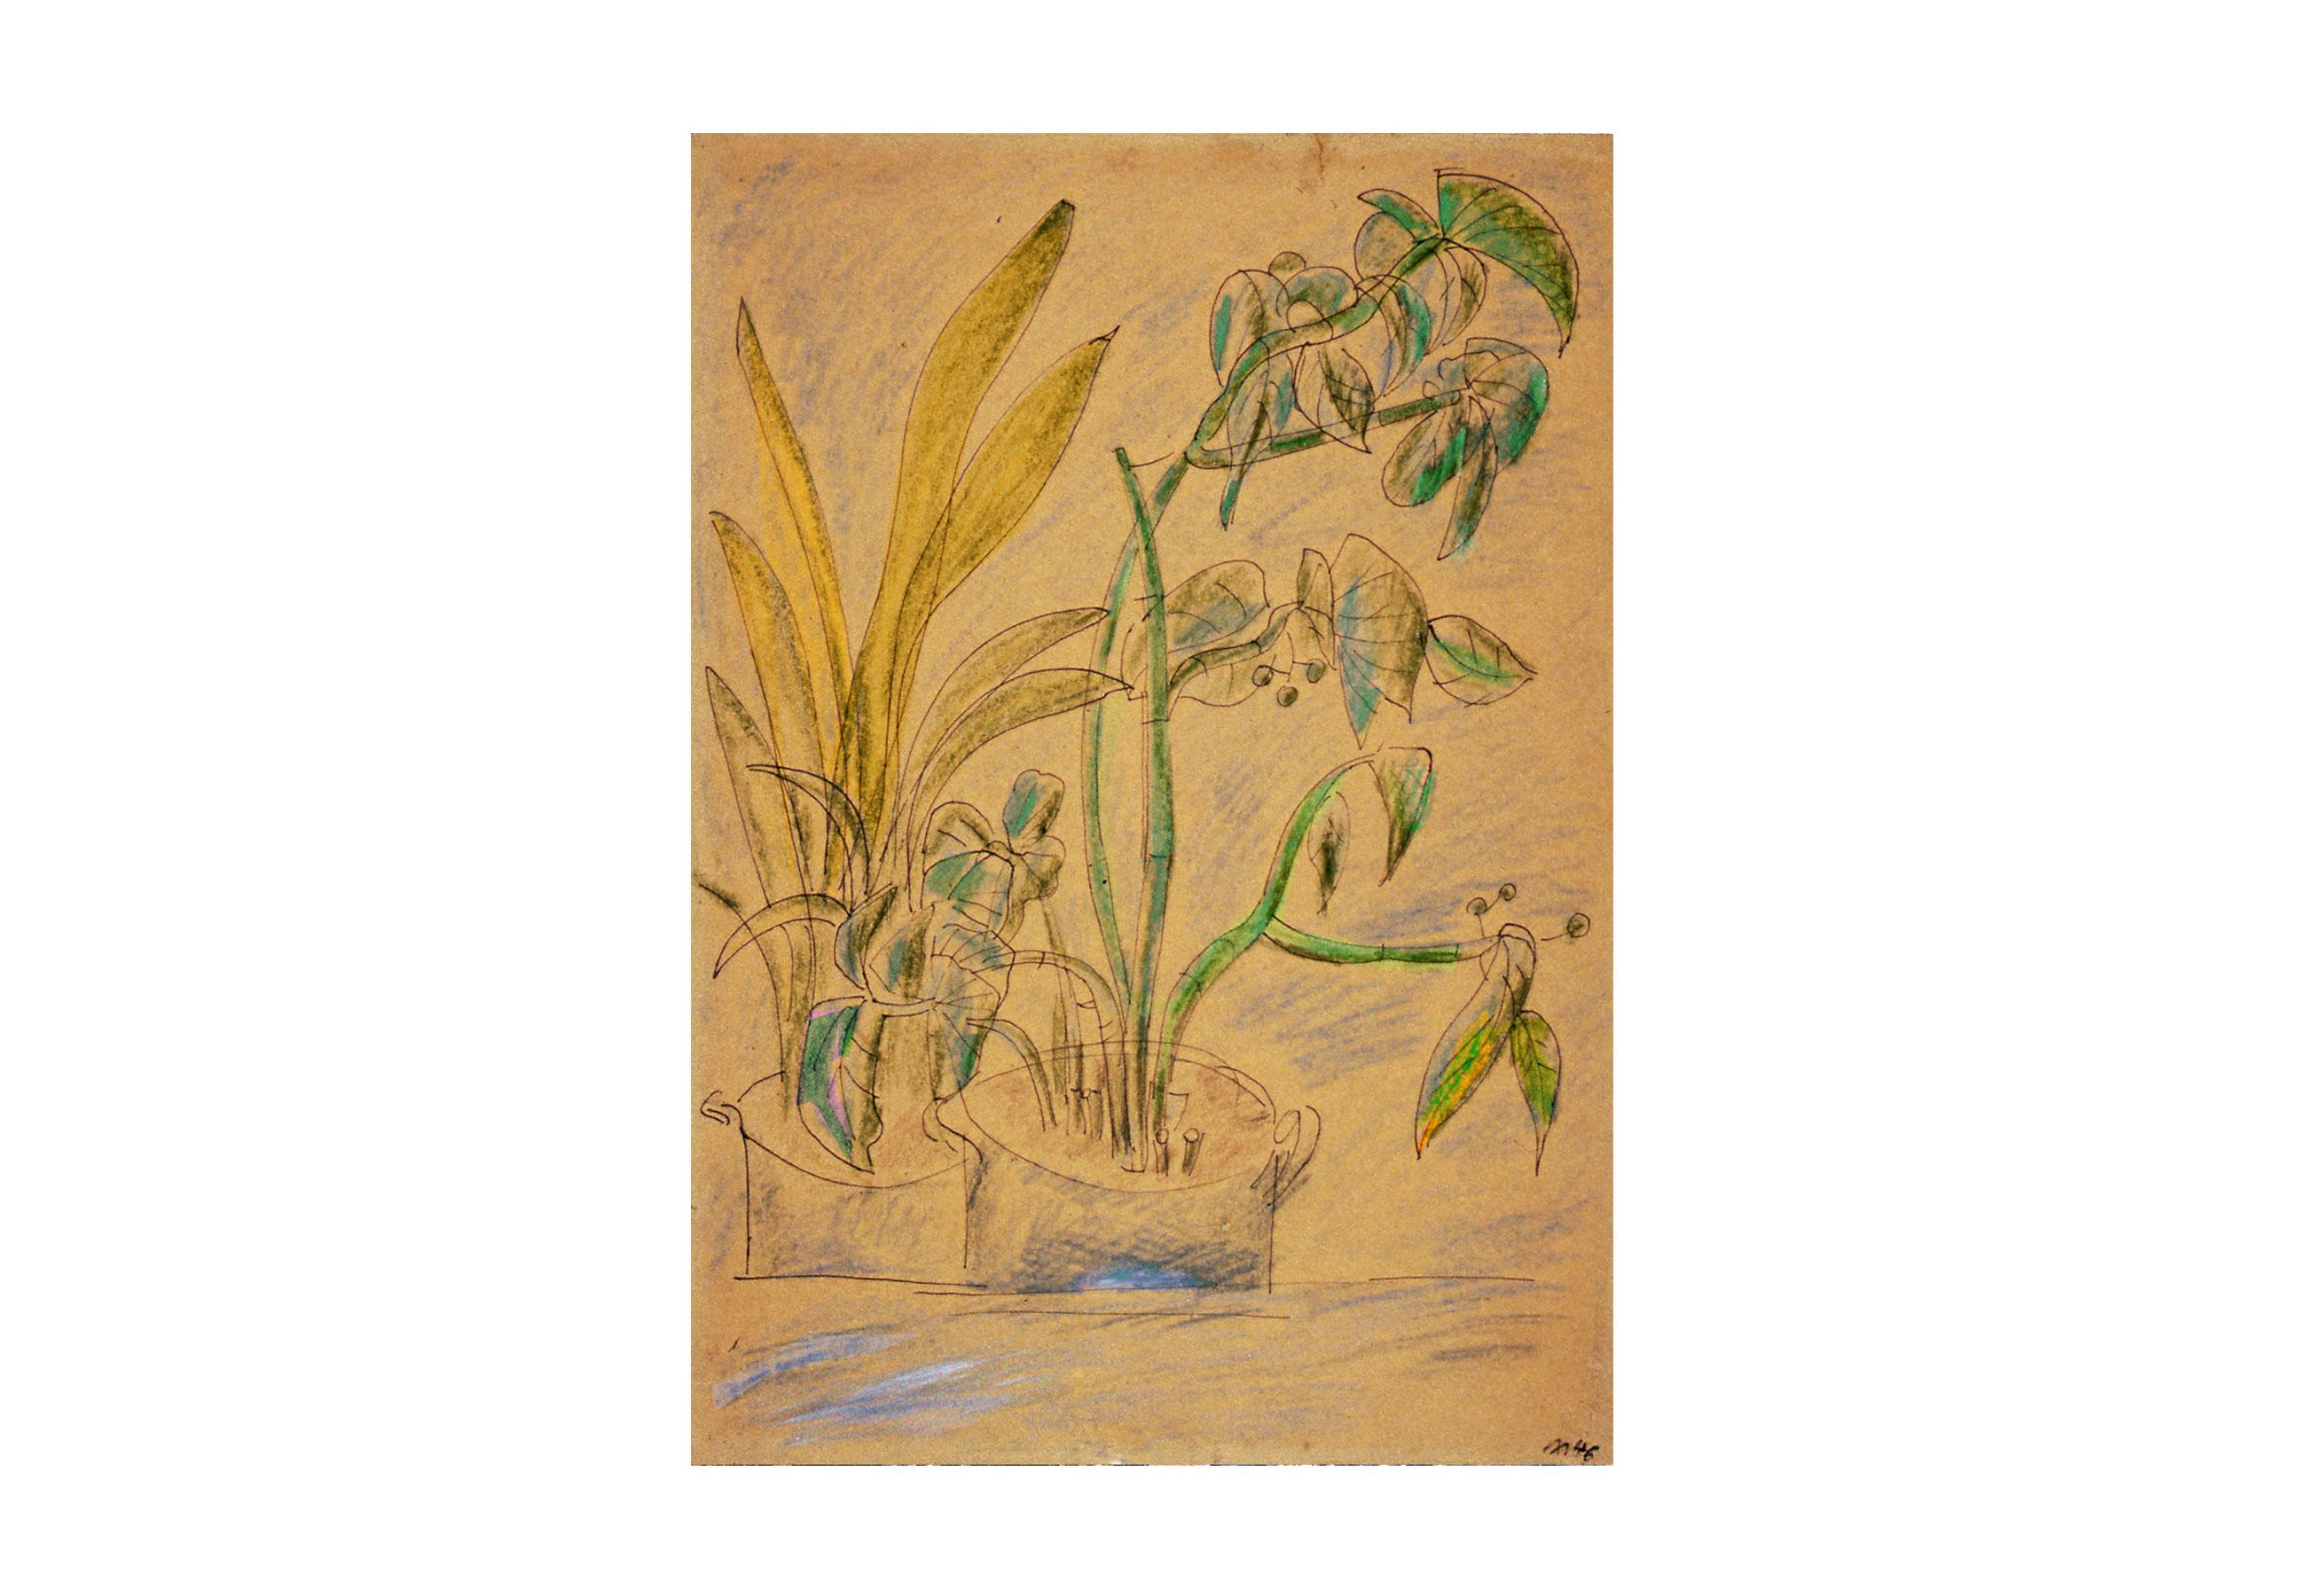 Lamm-Portfolio-Hause-Plants.jpg